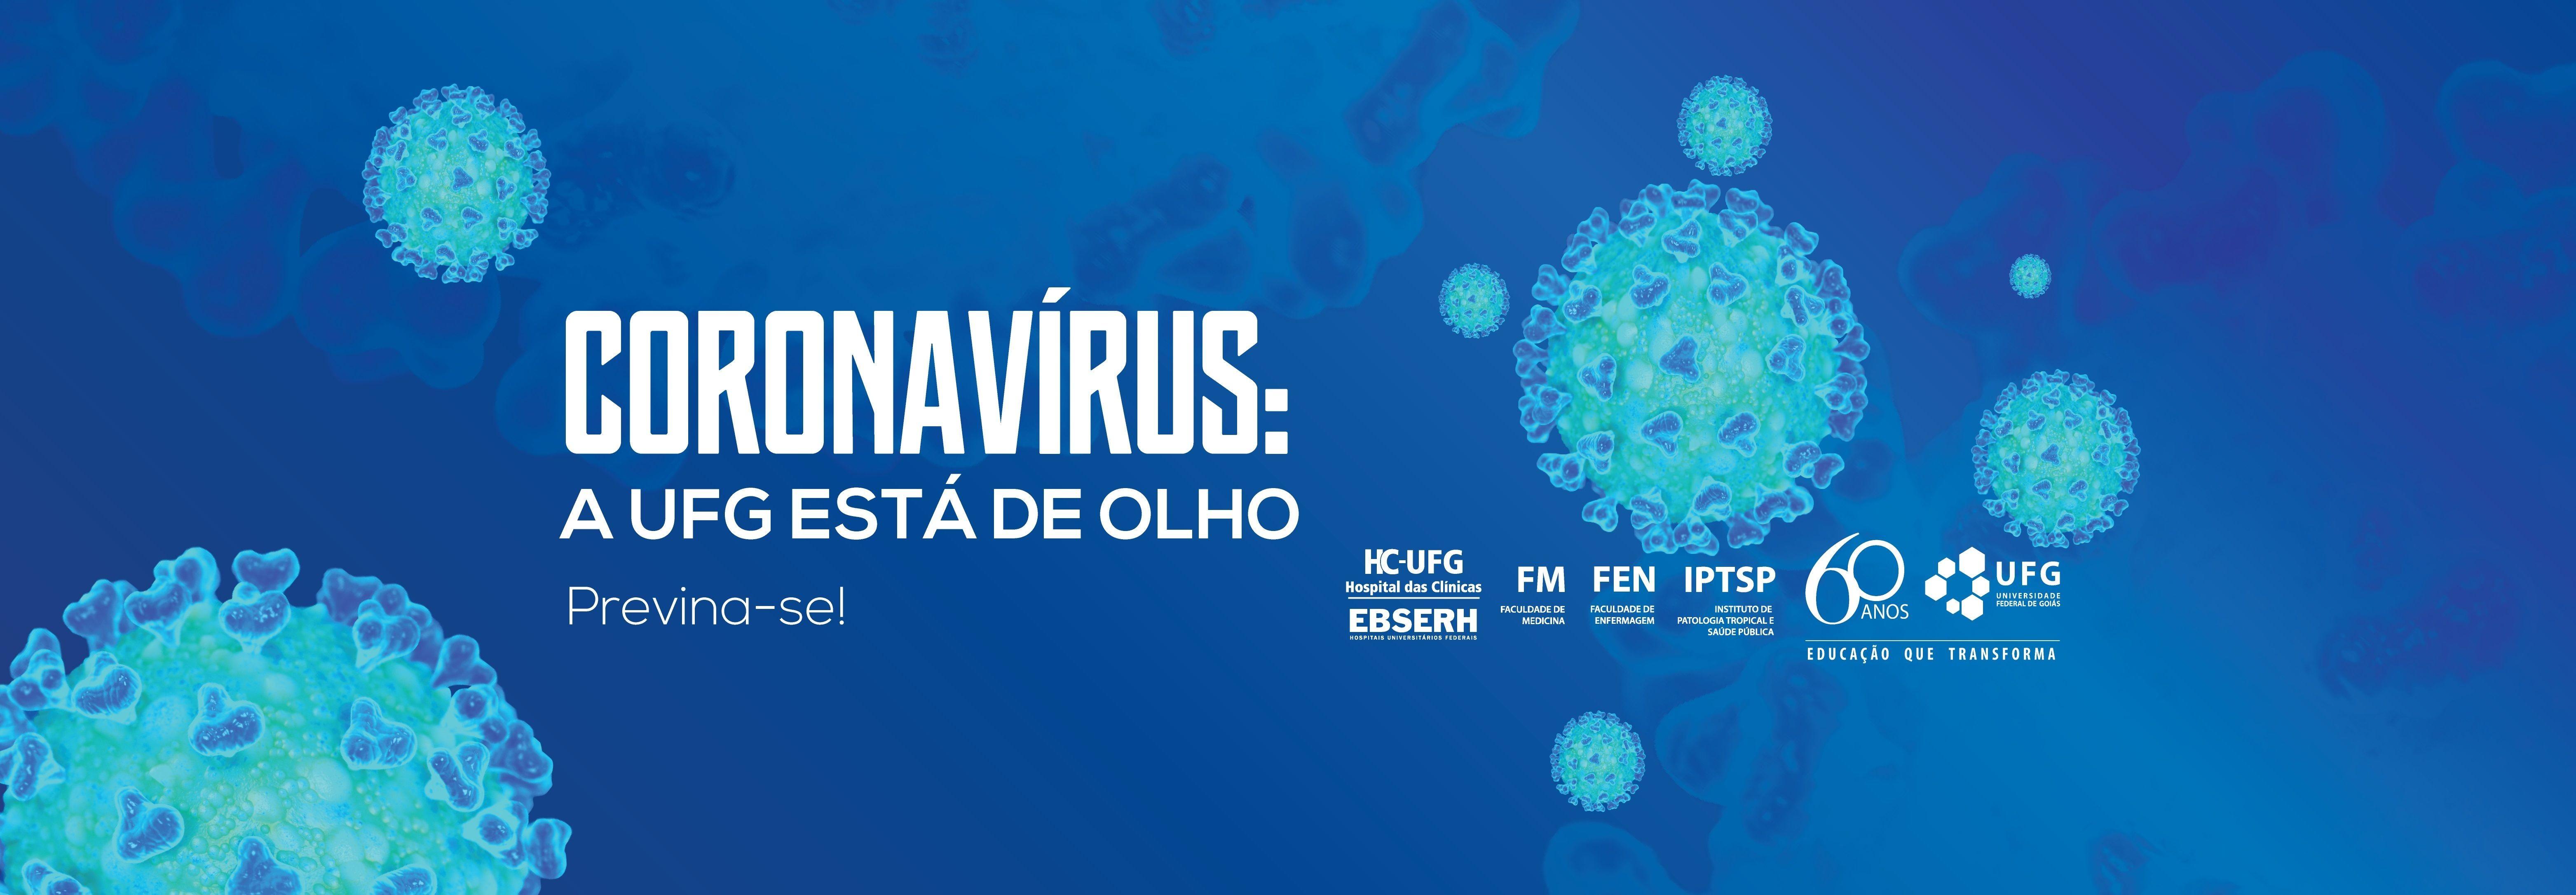 Banner - Coronavírus